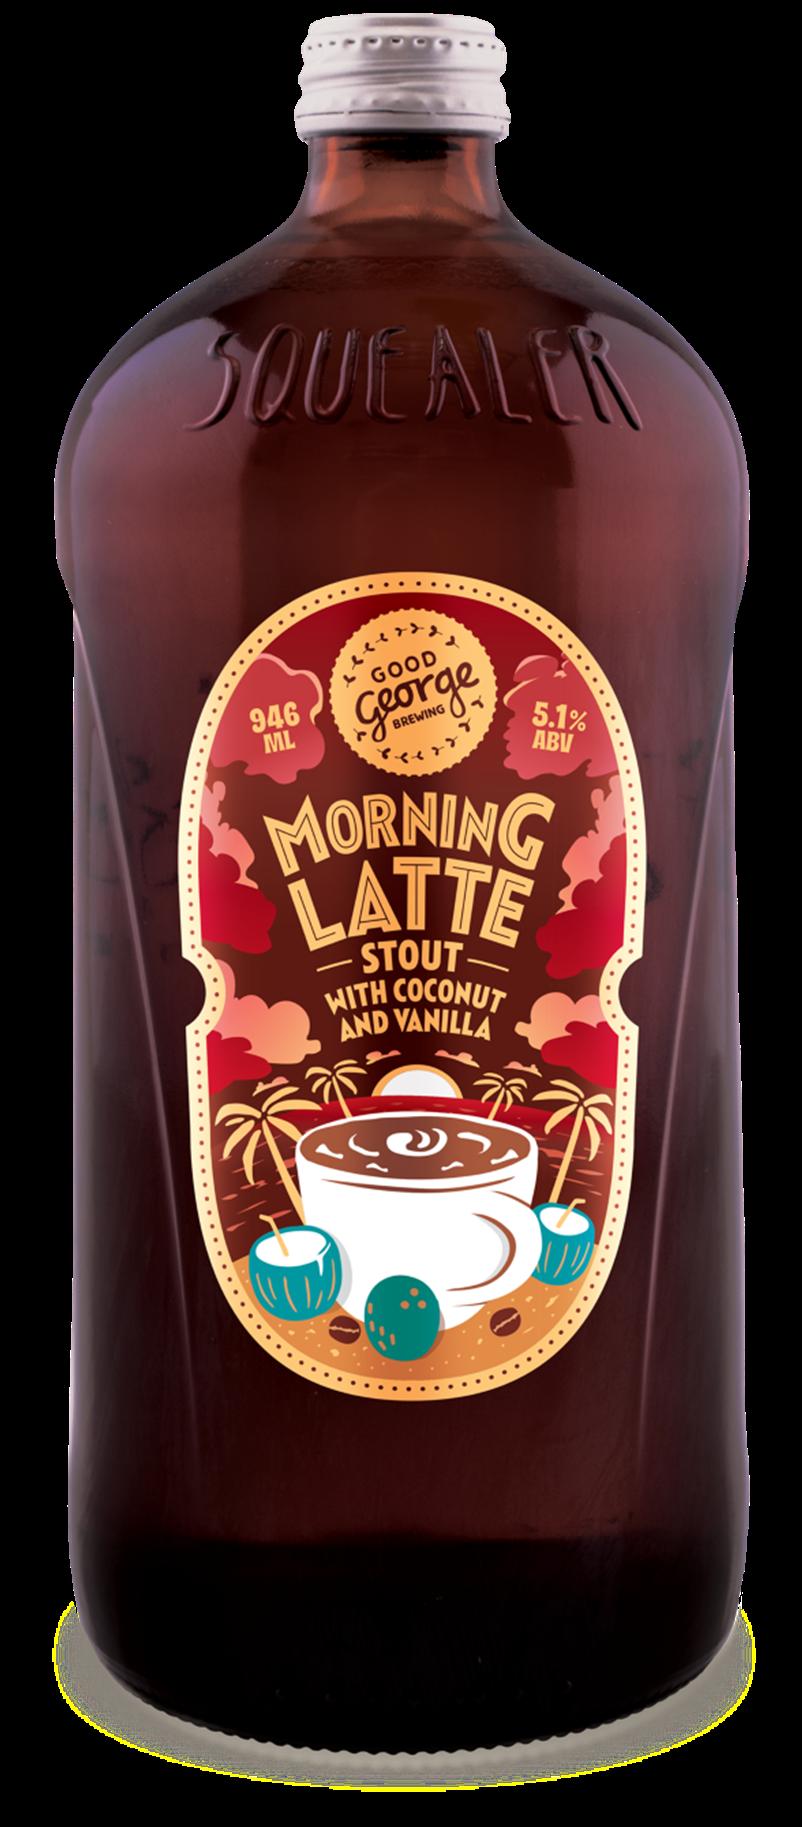 Good George Morning Latte Stout